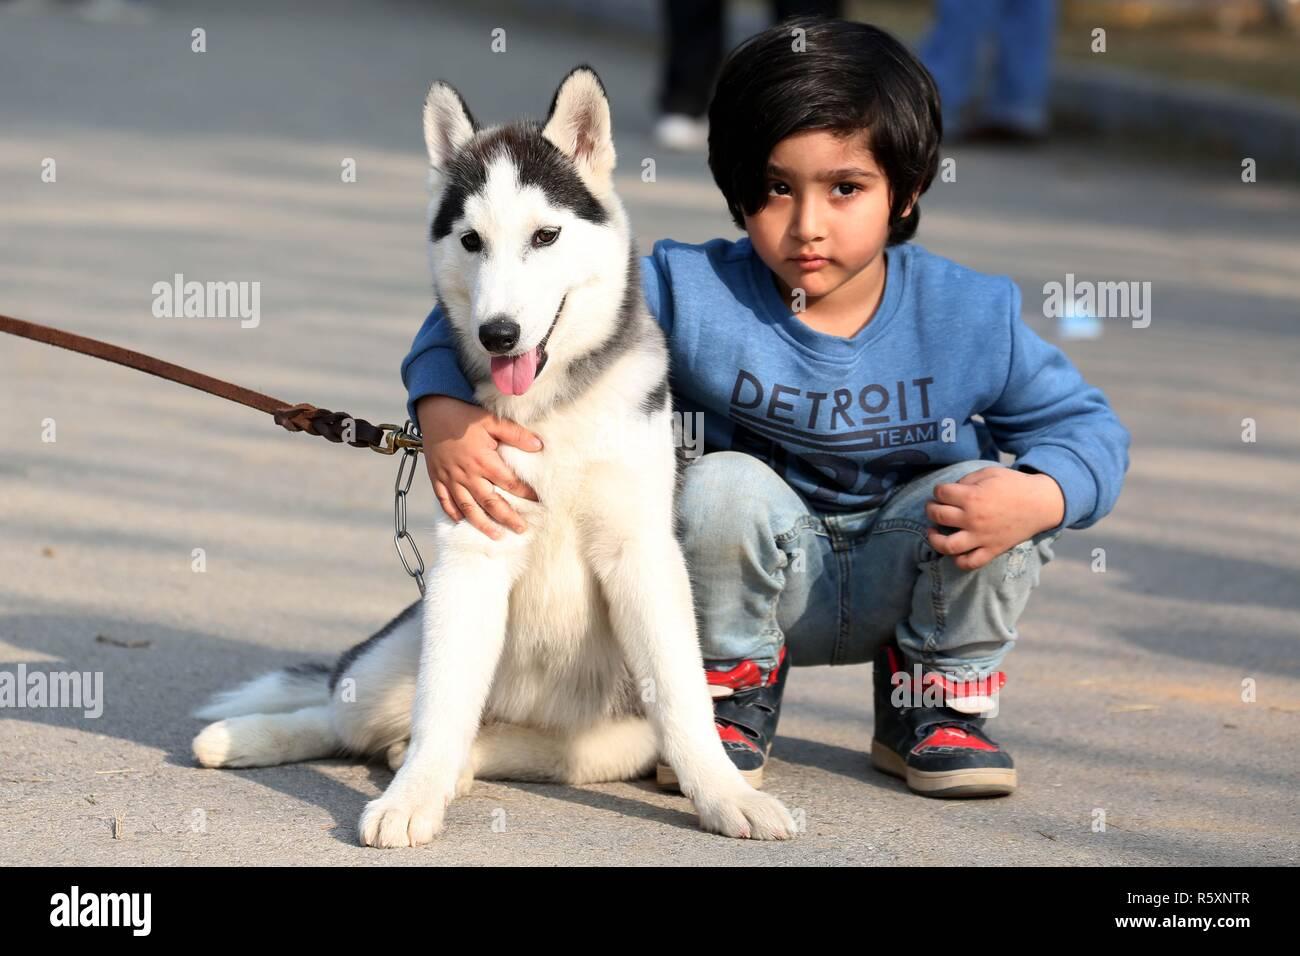 Islamabad, Pakistan  2nd Dec, 2018  A boy poses with a Husky